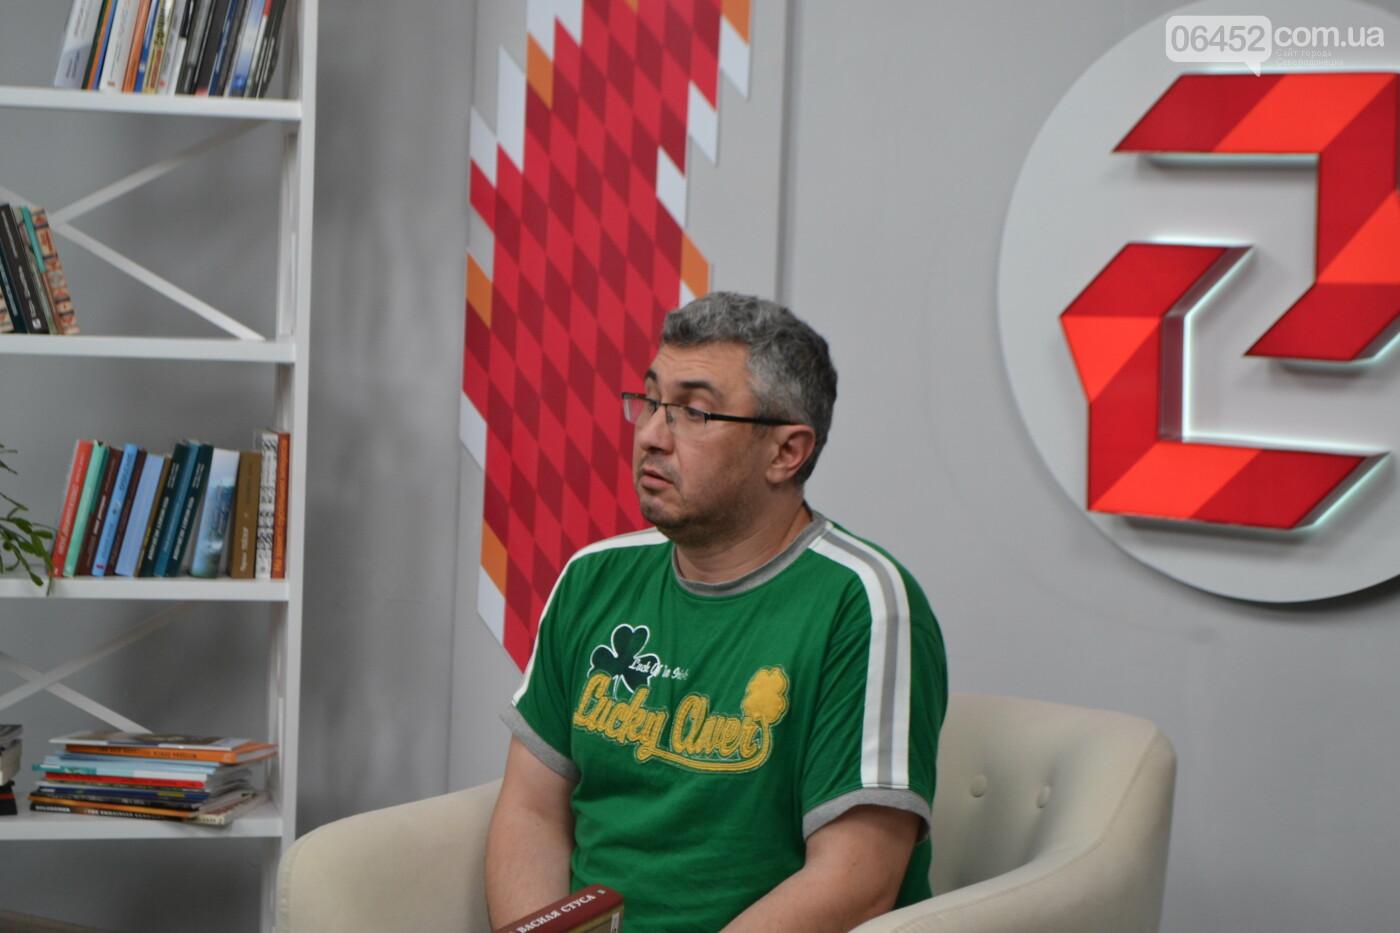 Северодончанам презентовали запрещенную книгу о Стусе , фото-1